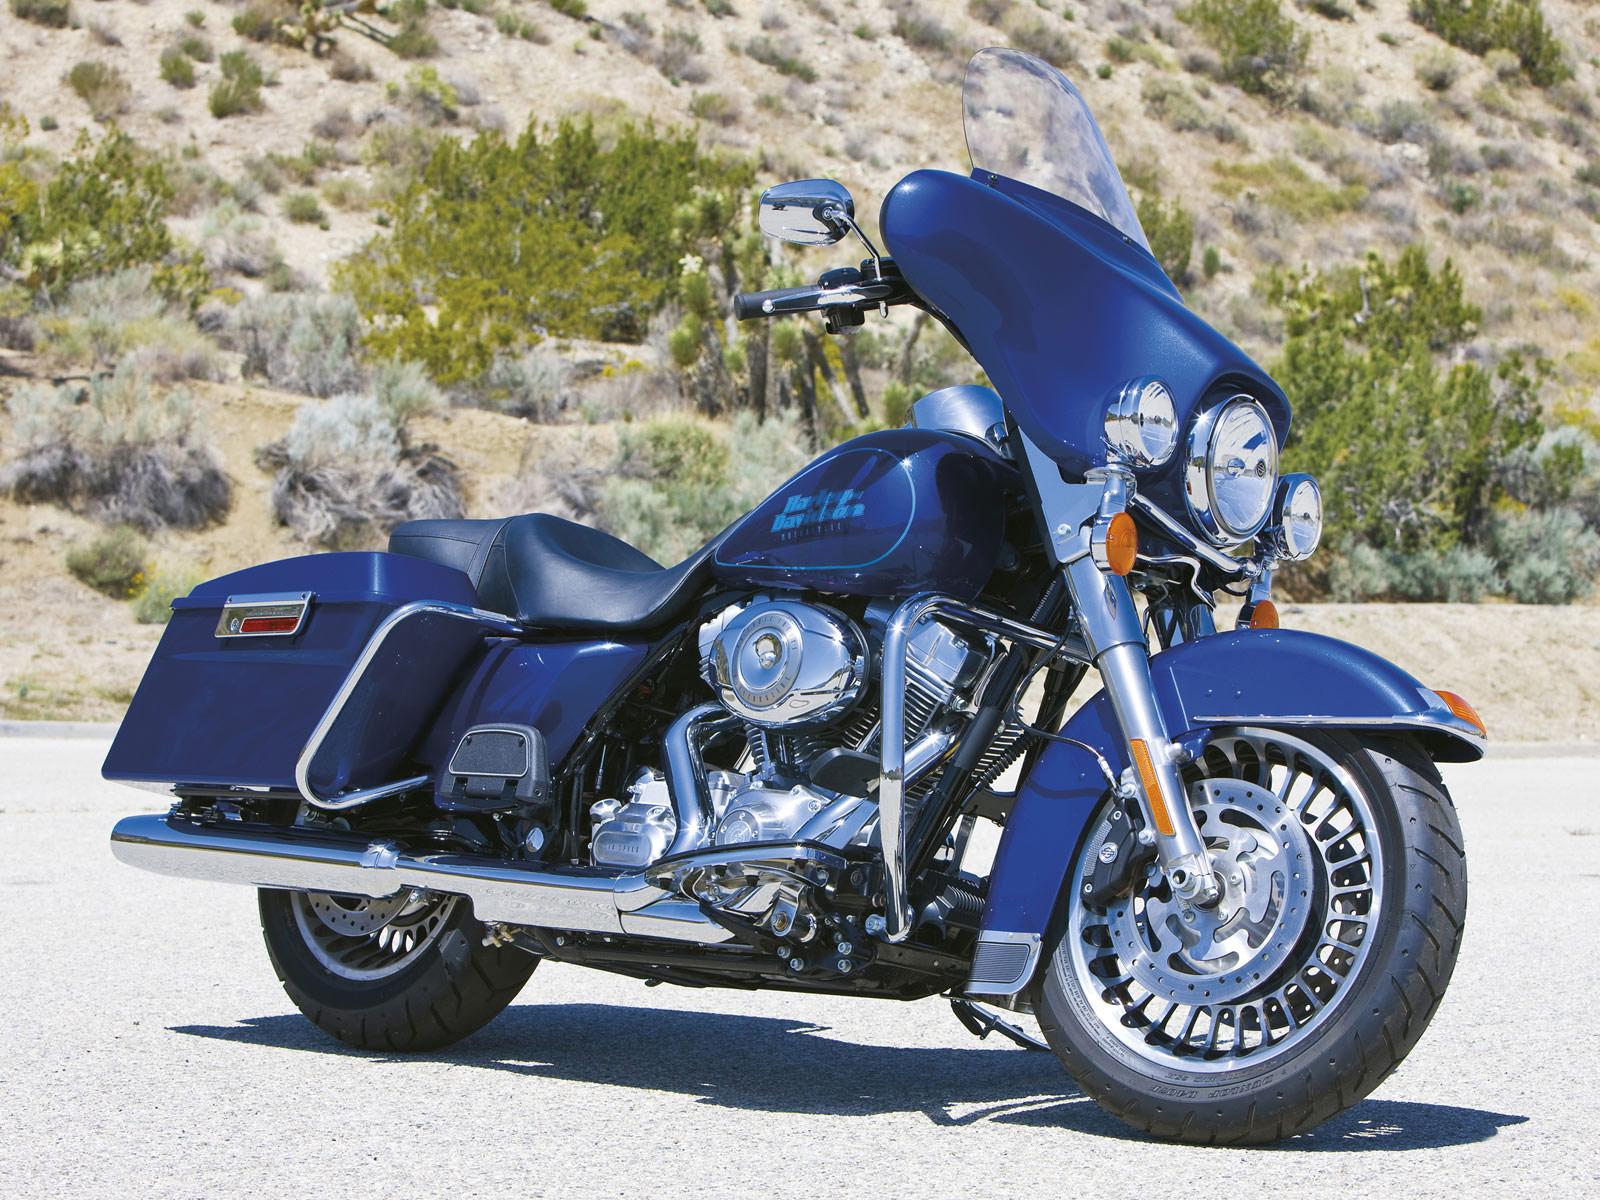 Harley Davidson: 2009 Harley-Davidson FLHTI Electra Glide Standard